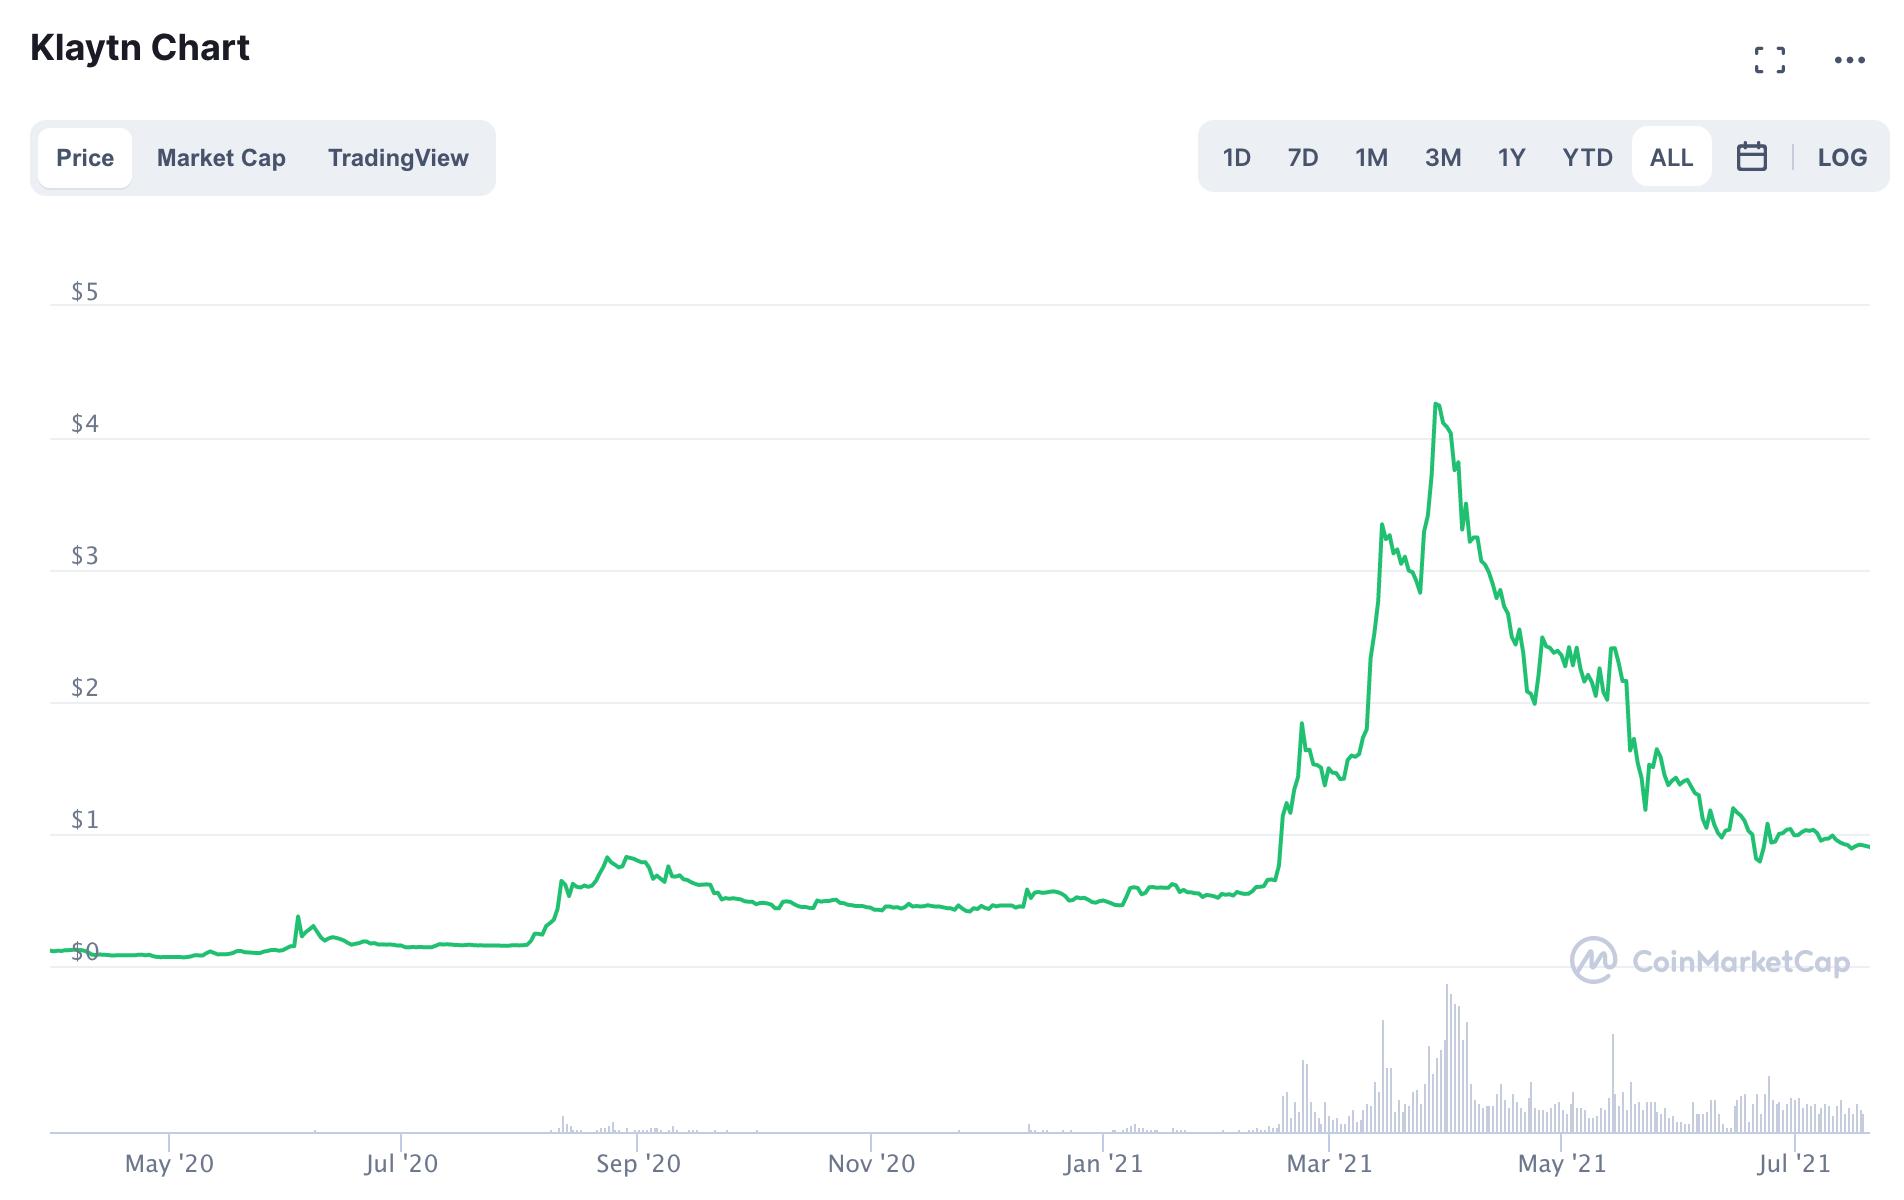 KLAY/USD Price